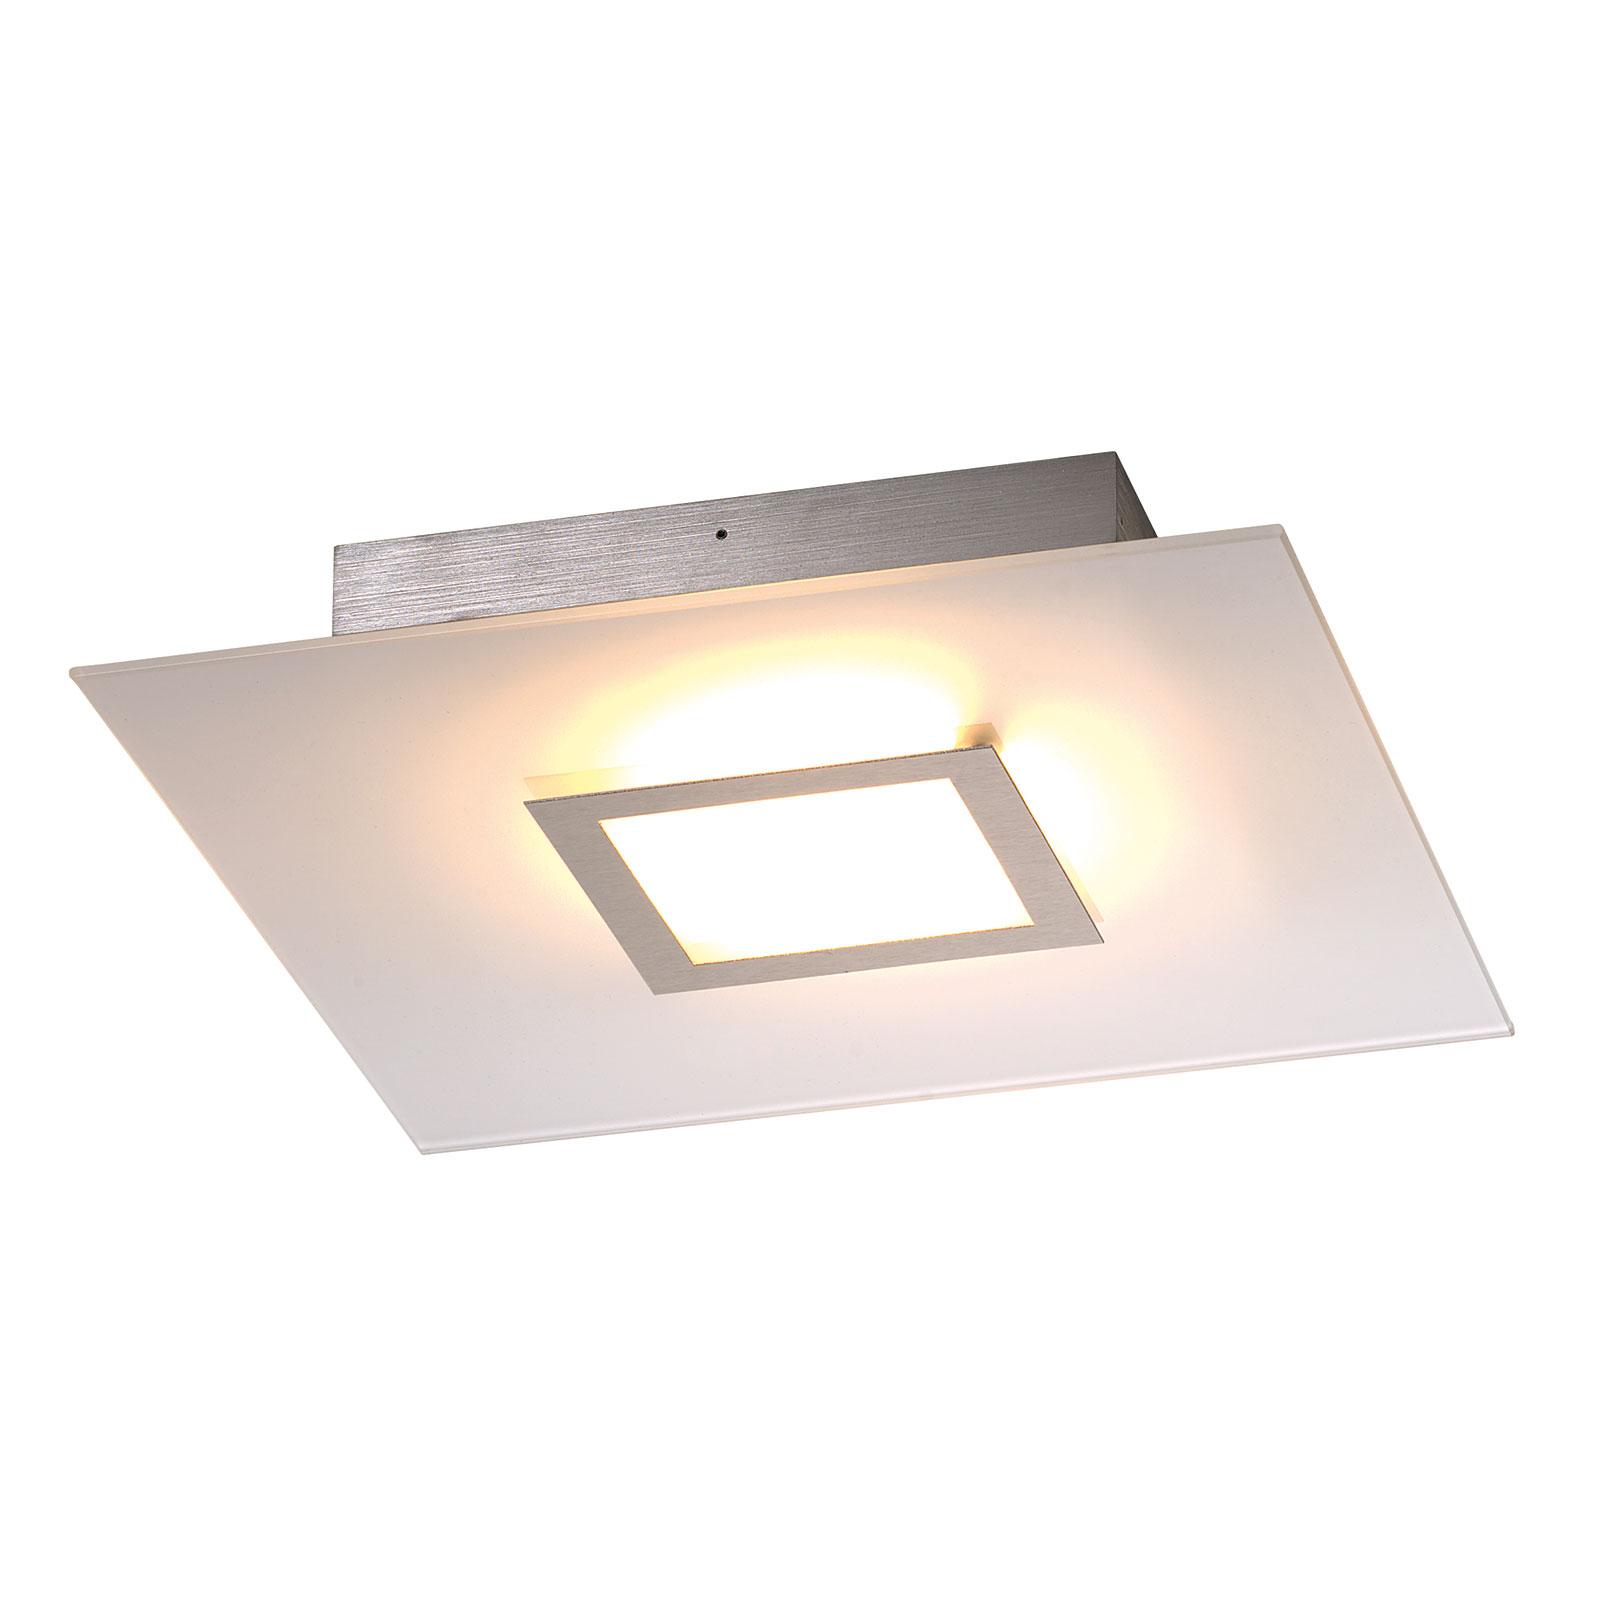 Flat – kvadratisk LED-taklampa, dimbar